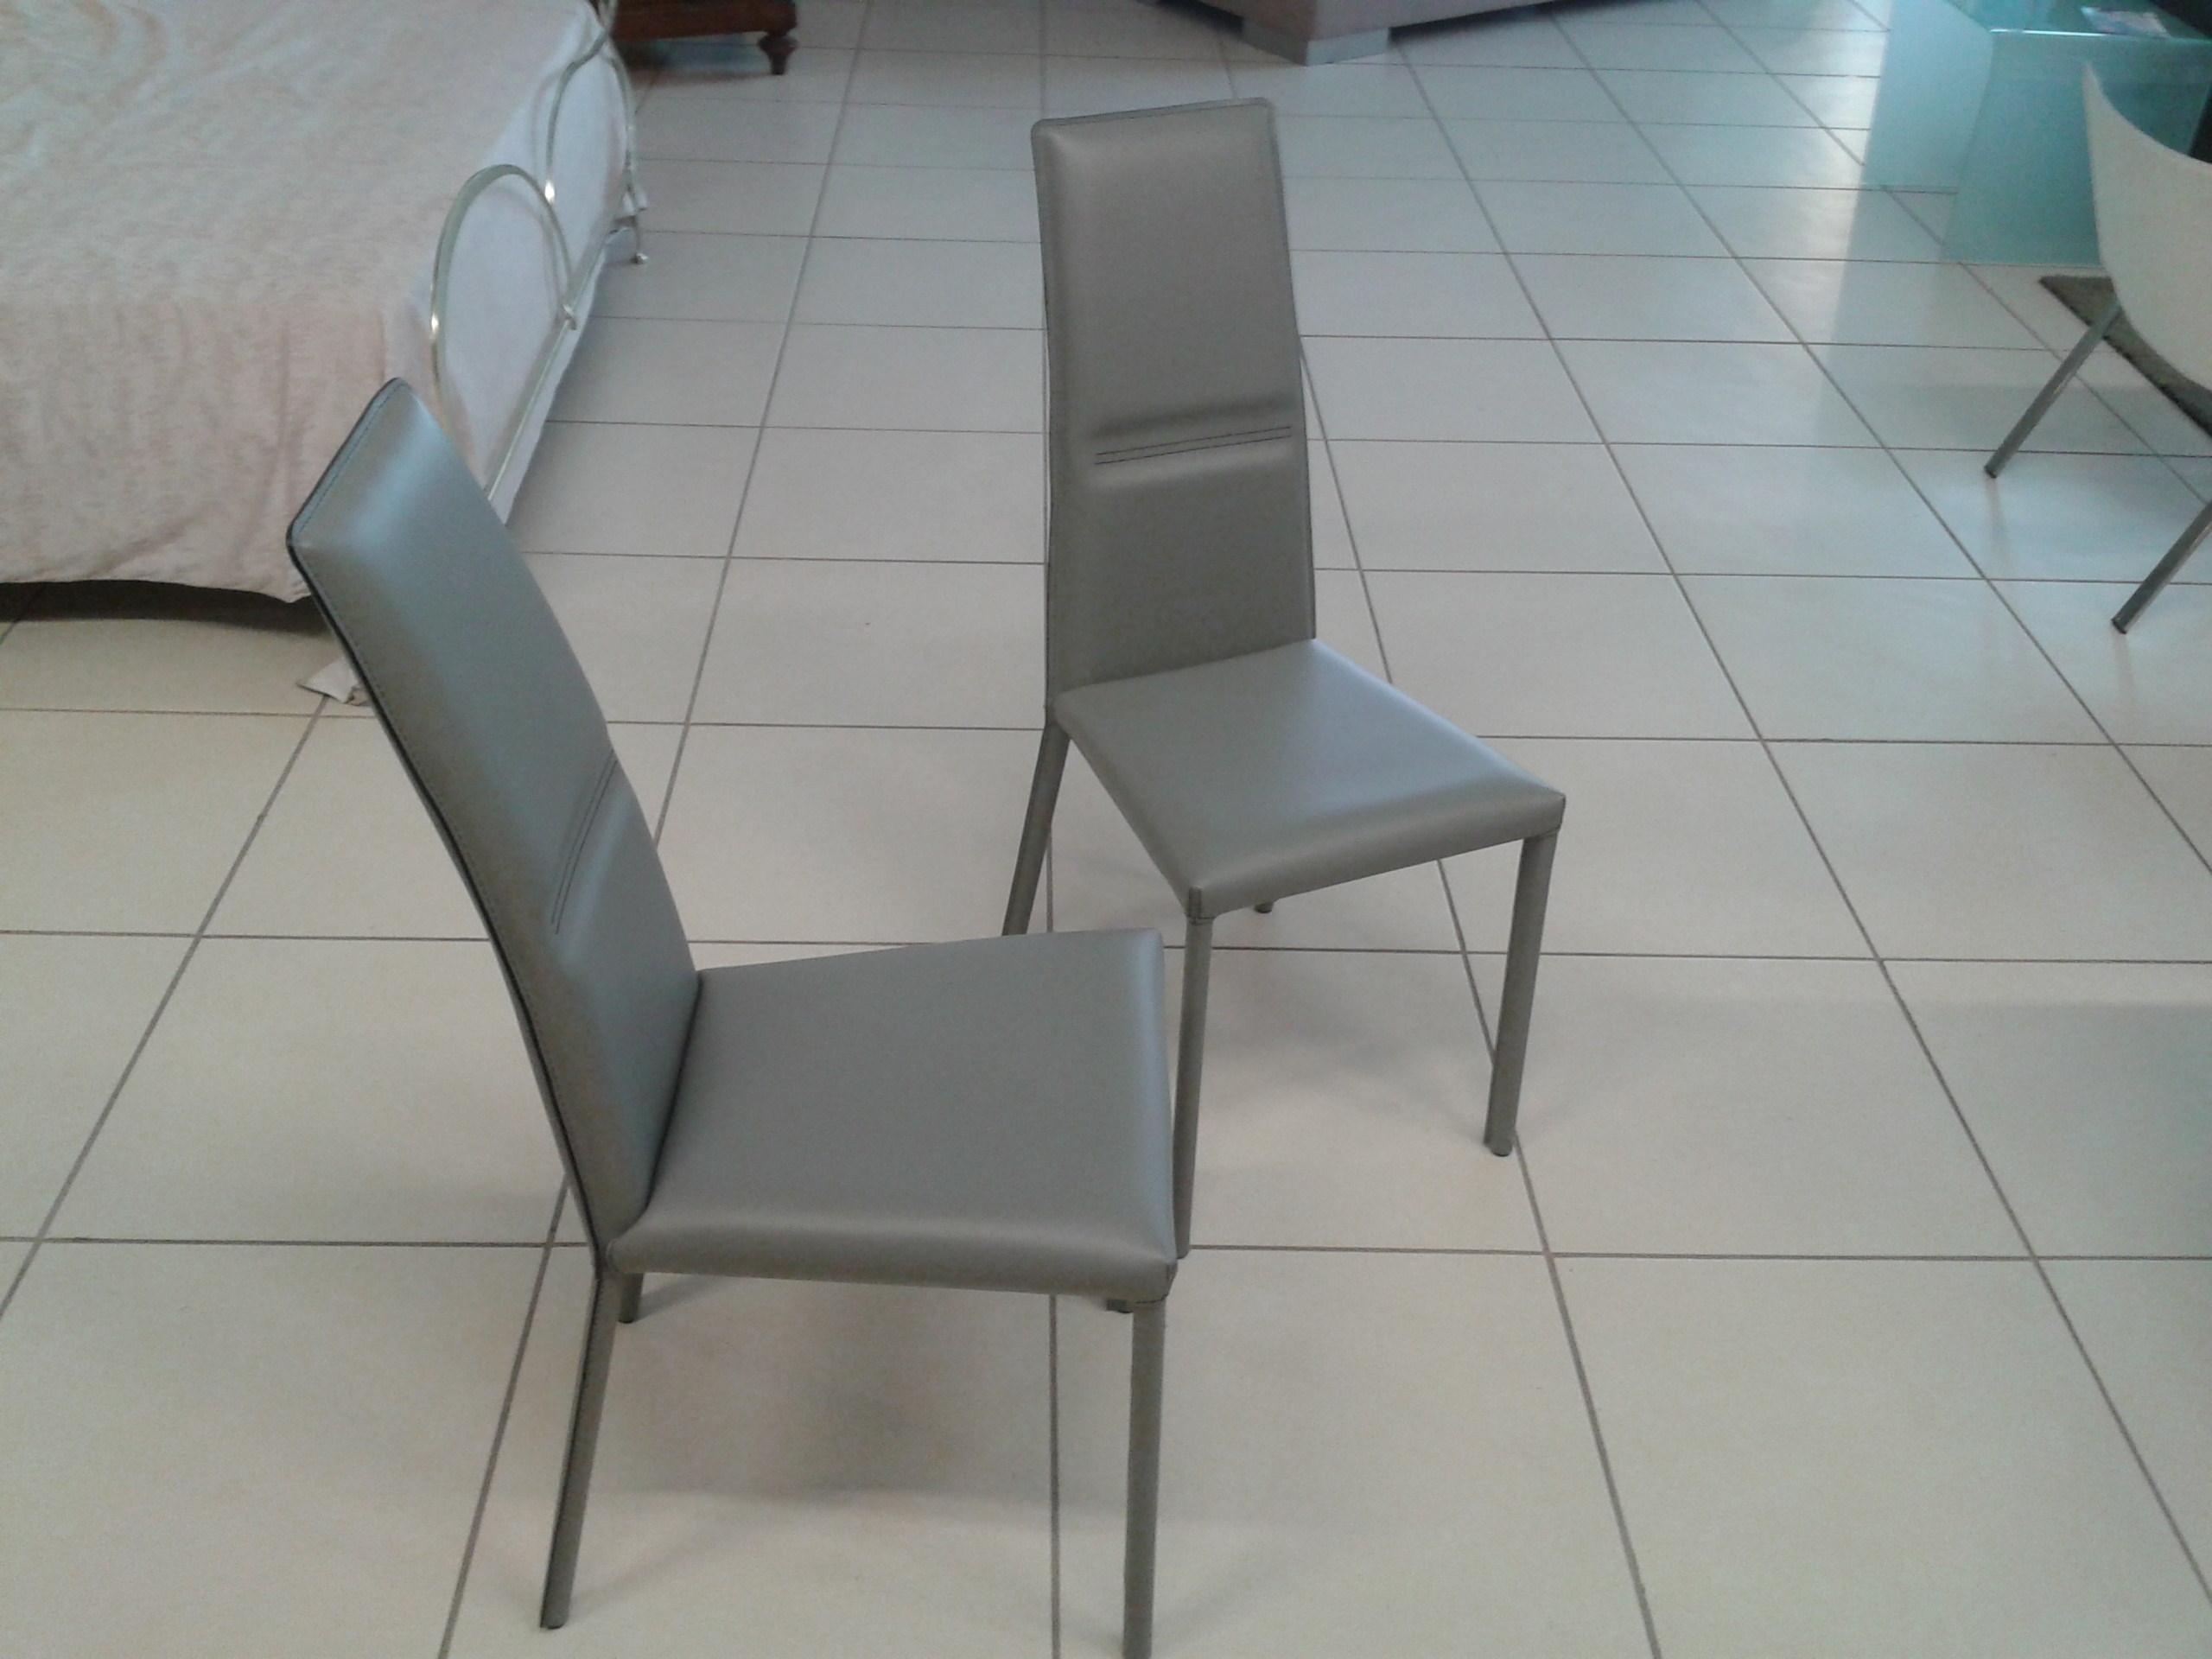 4 sedie bonaldo sedie cuoio lyu scontato del 40 sedie for Sedie cuoio prezzi